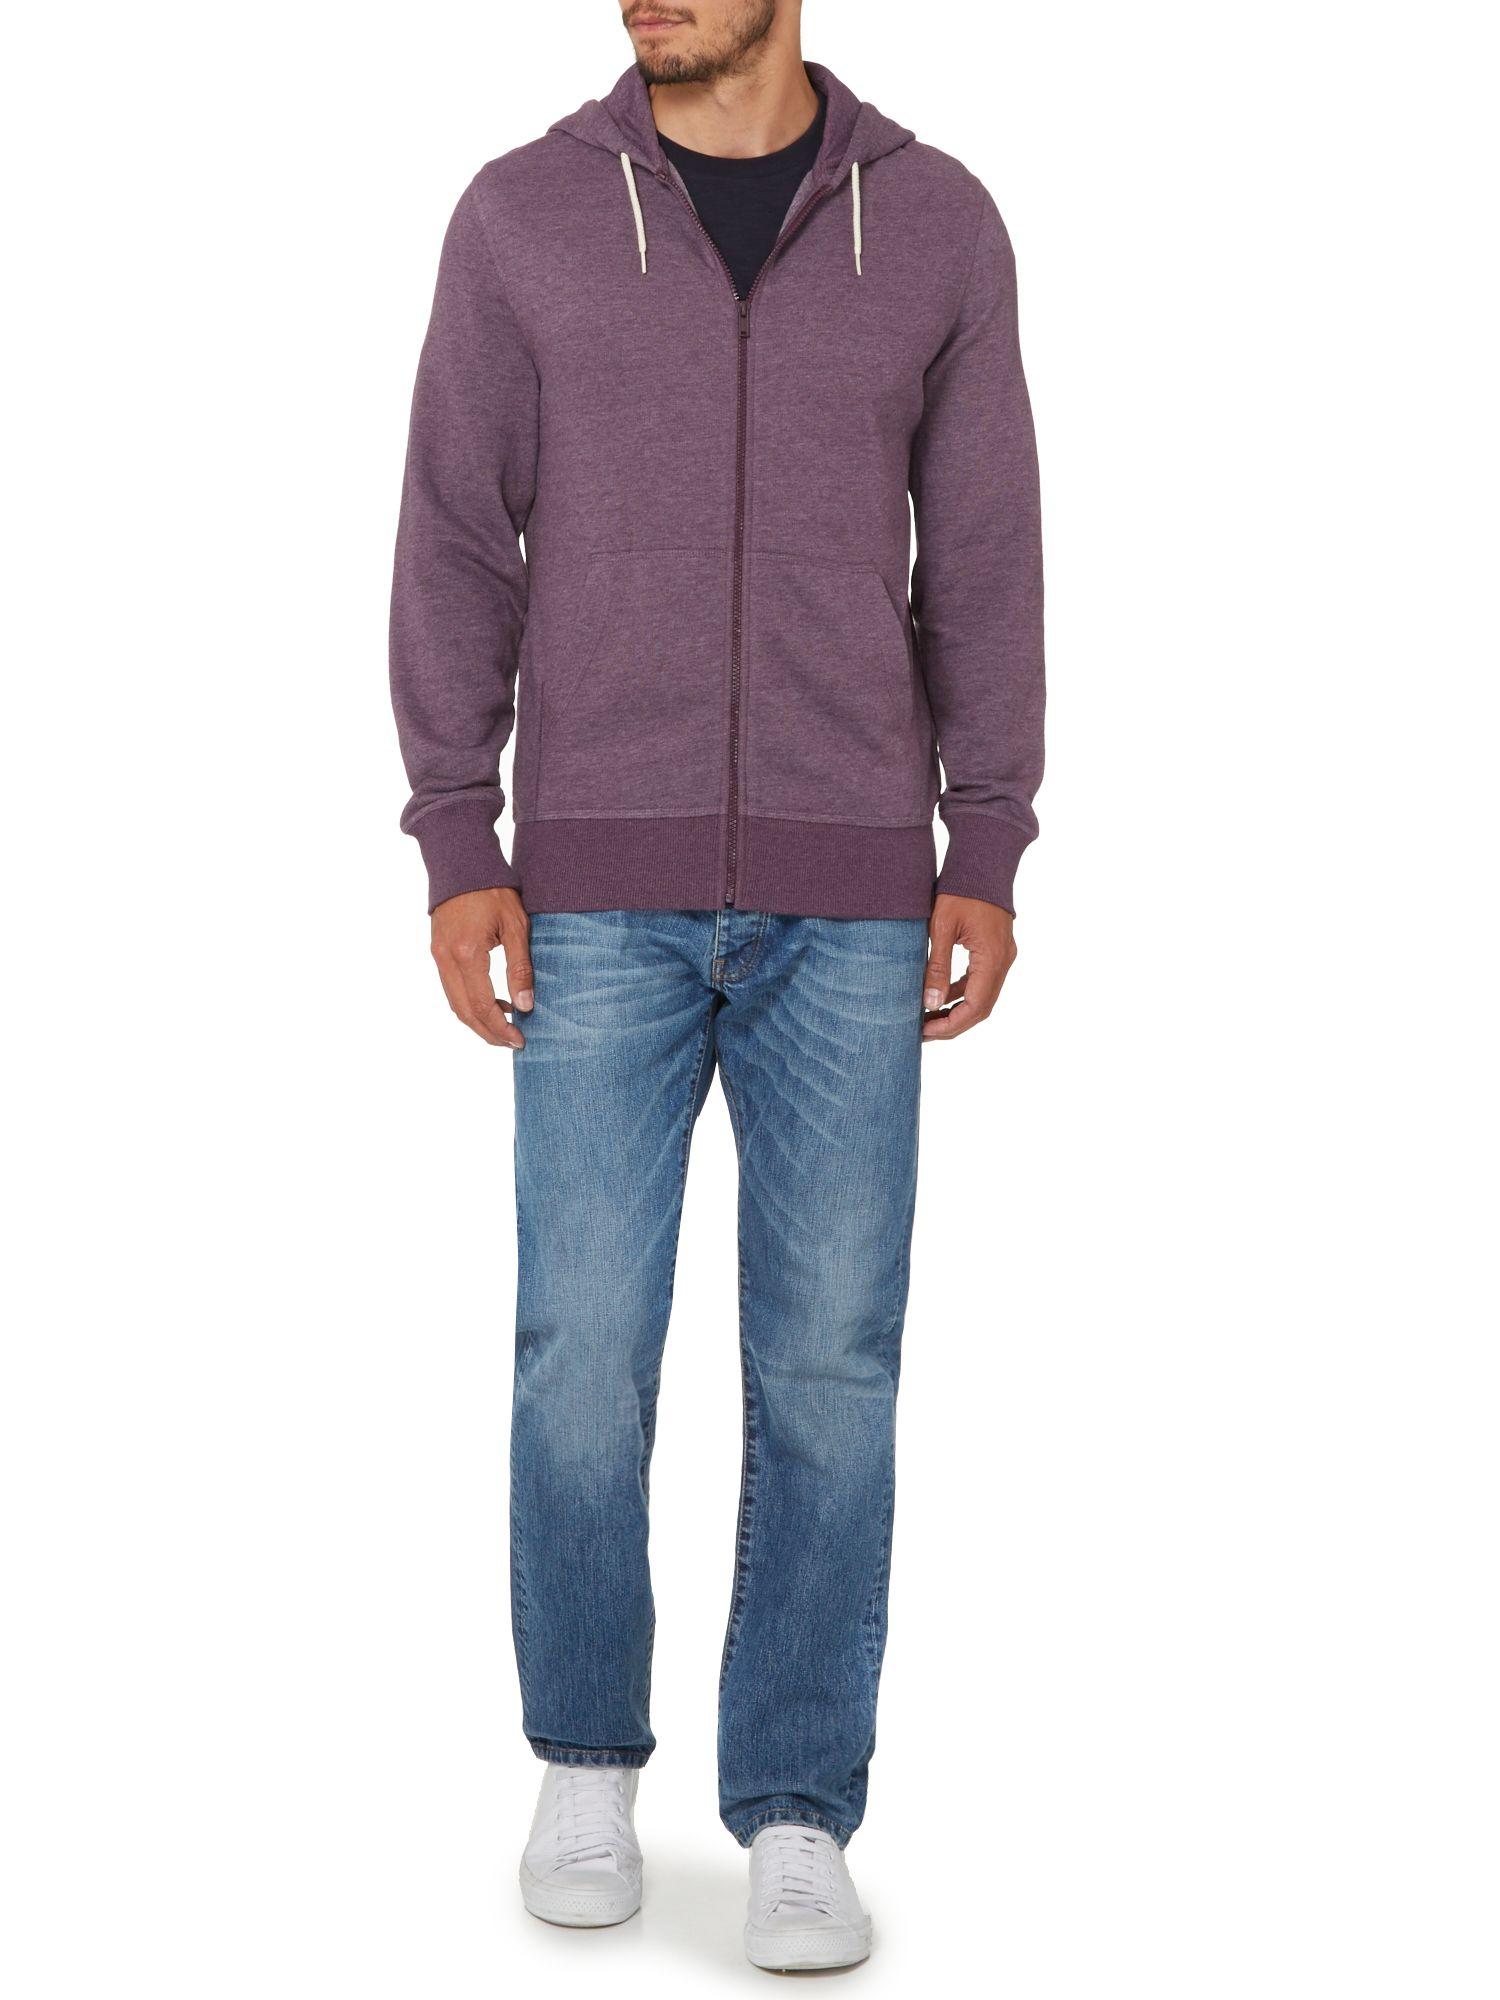 Criminal Morgan Zip Through Hoody In Purple For Men Lyst